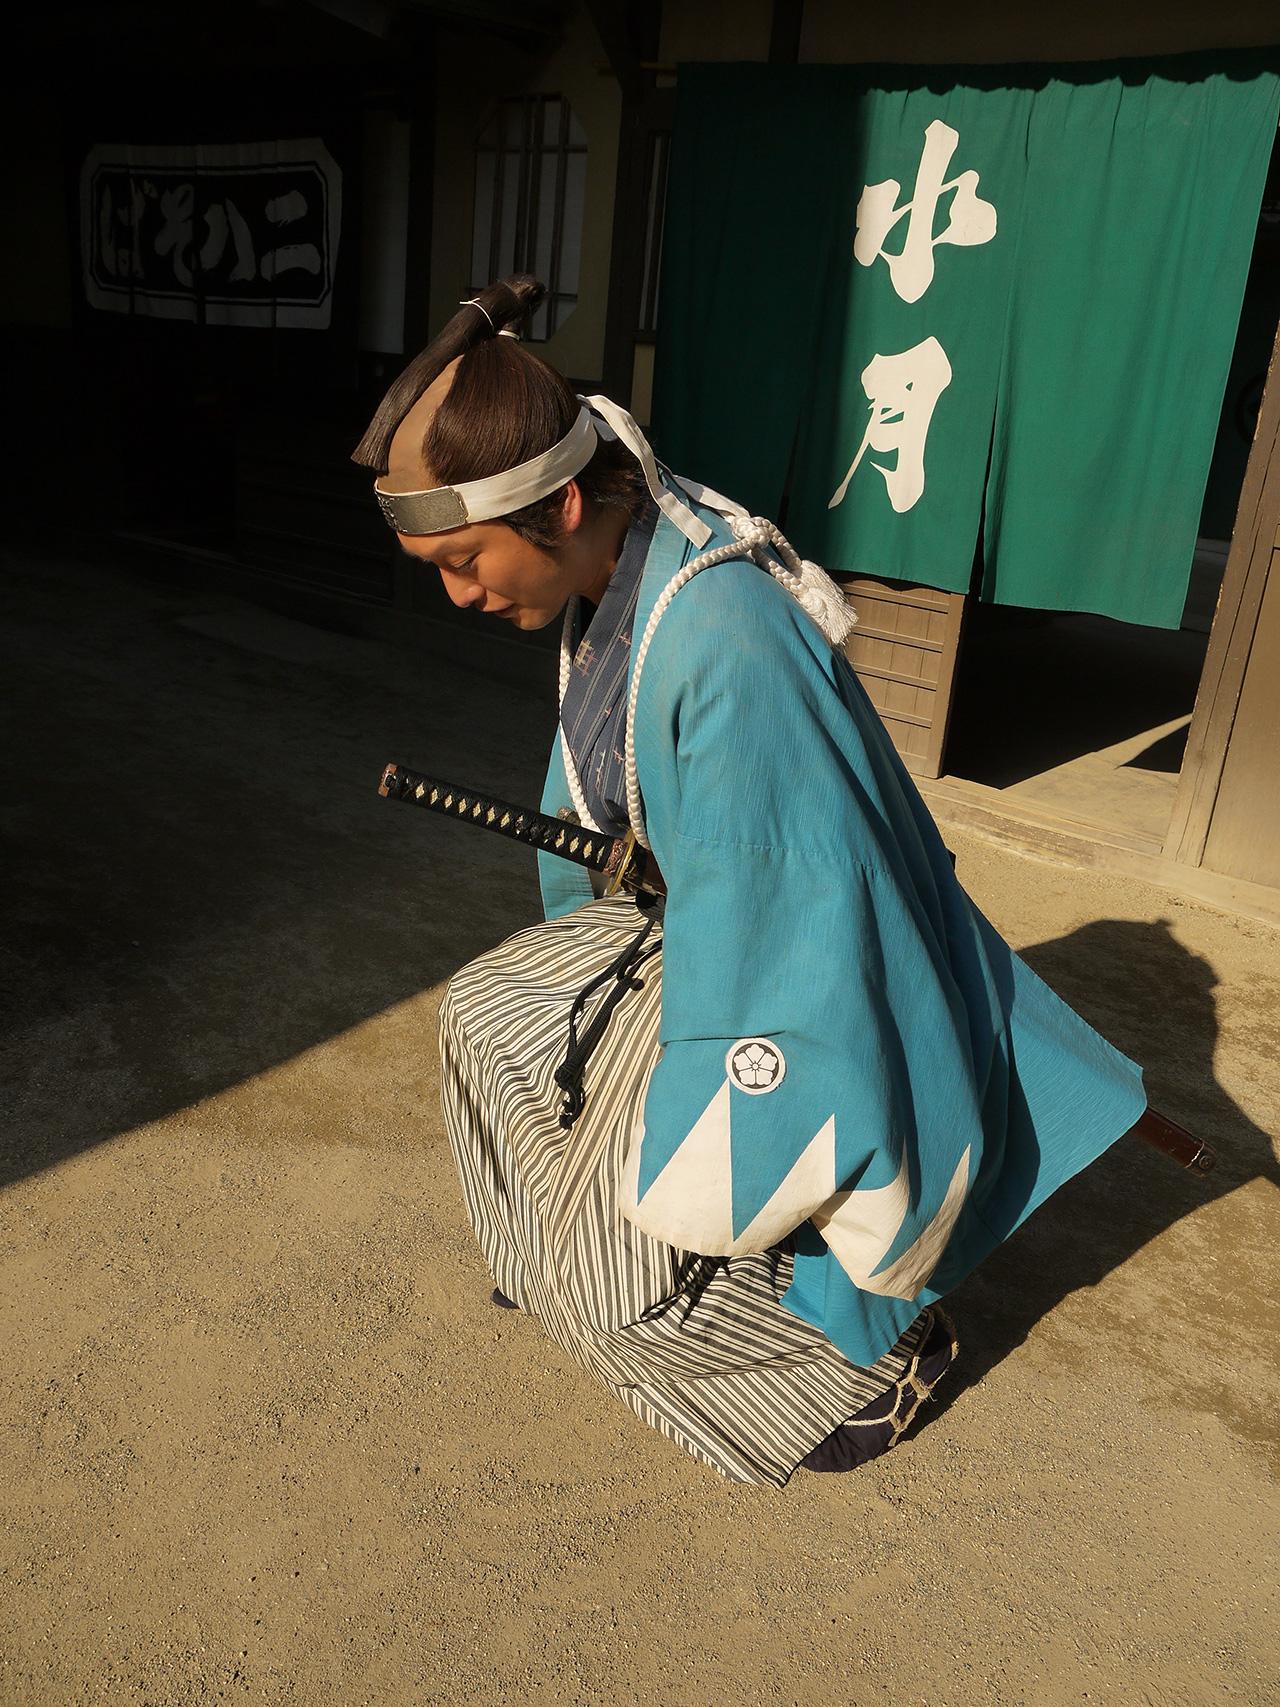 Takahiro Hotta kneeling